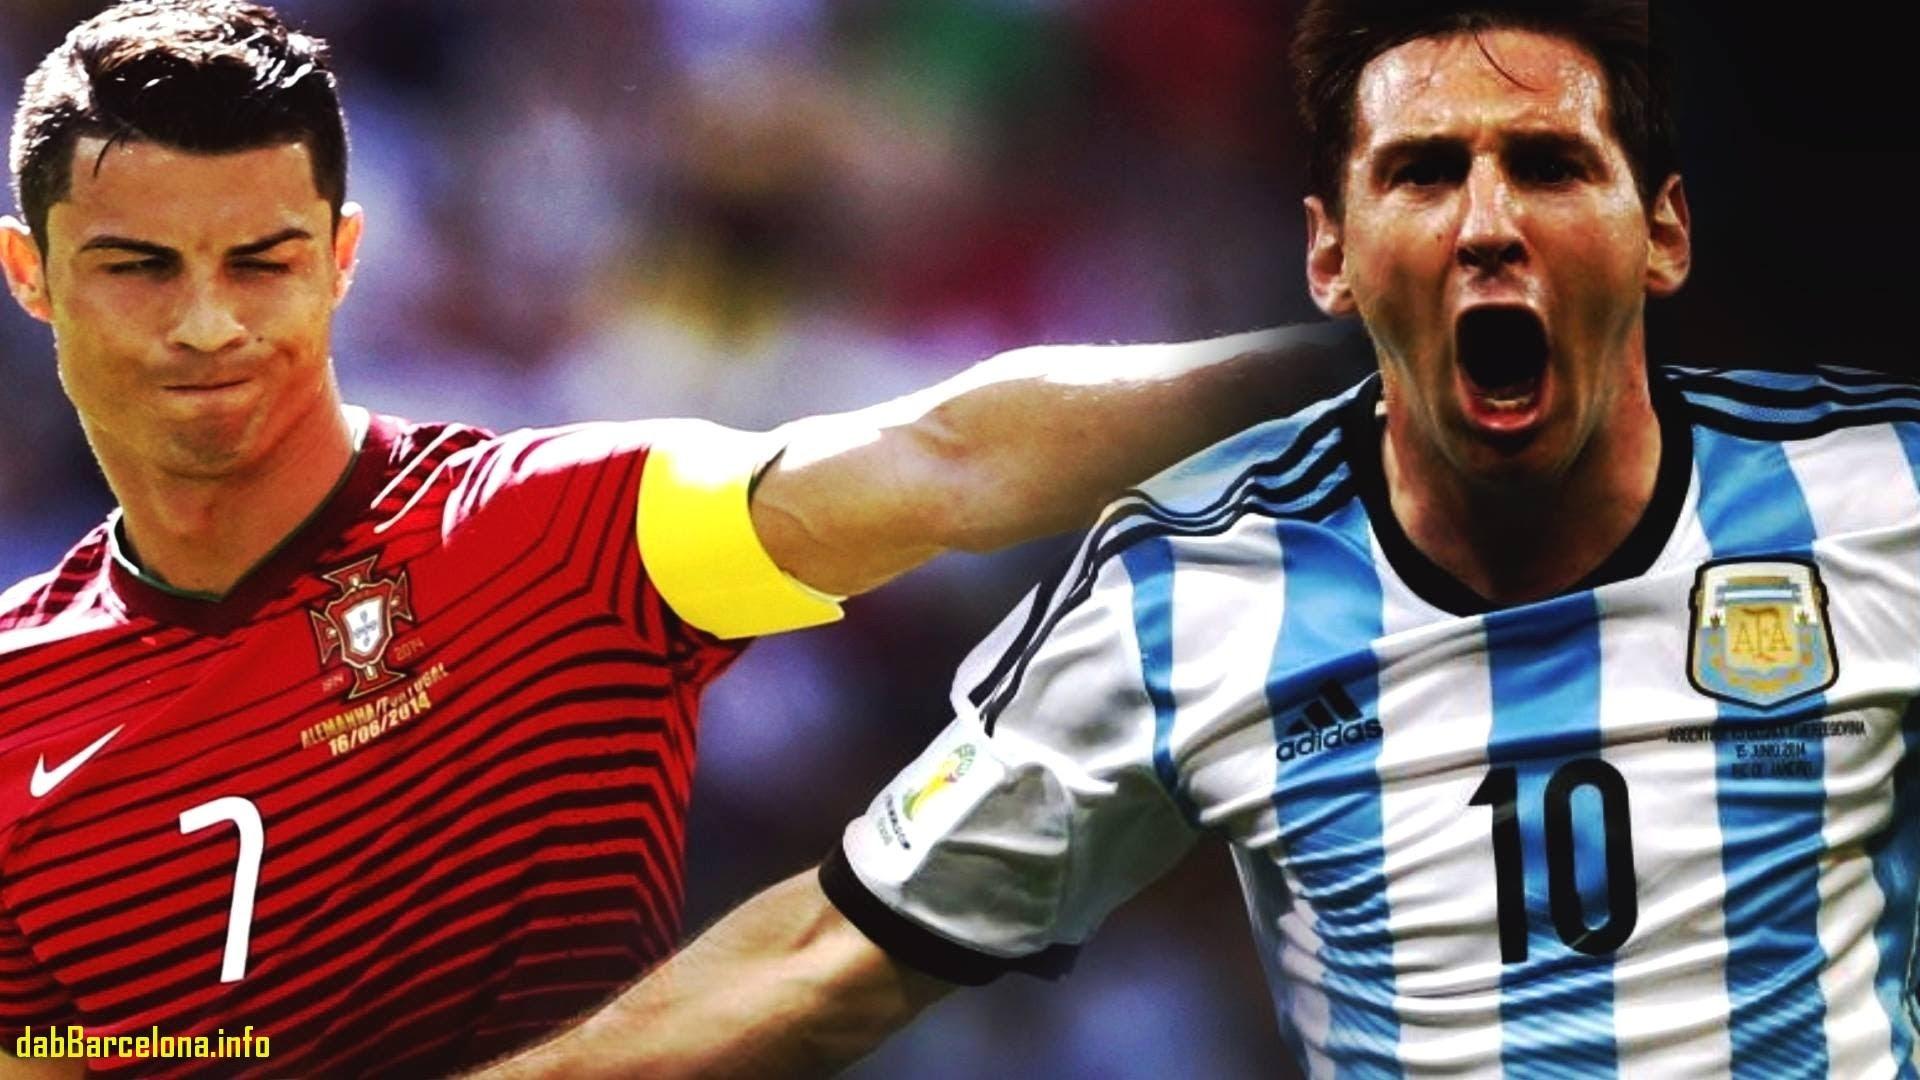 Messi Vs Ronaldo Wallpaper 2018 Hd 77 Images